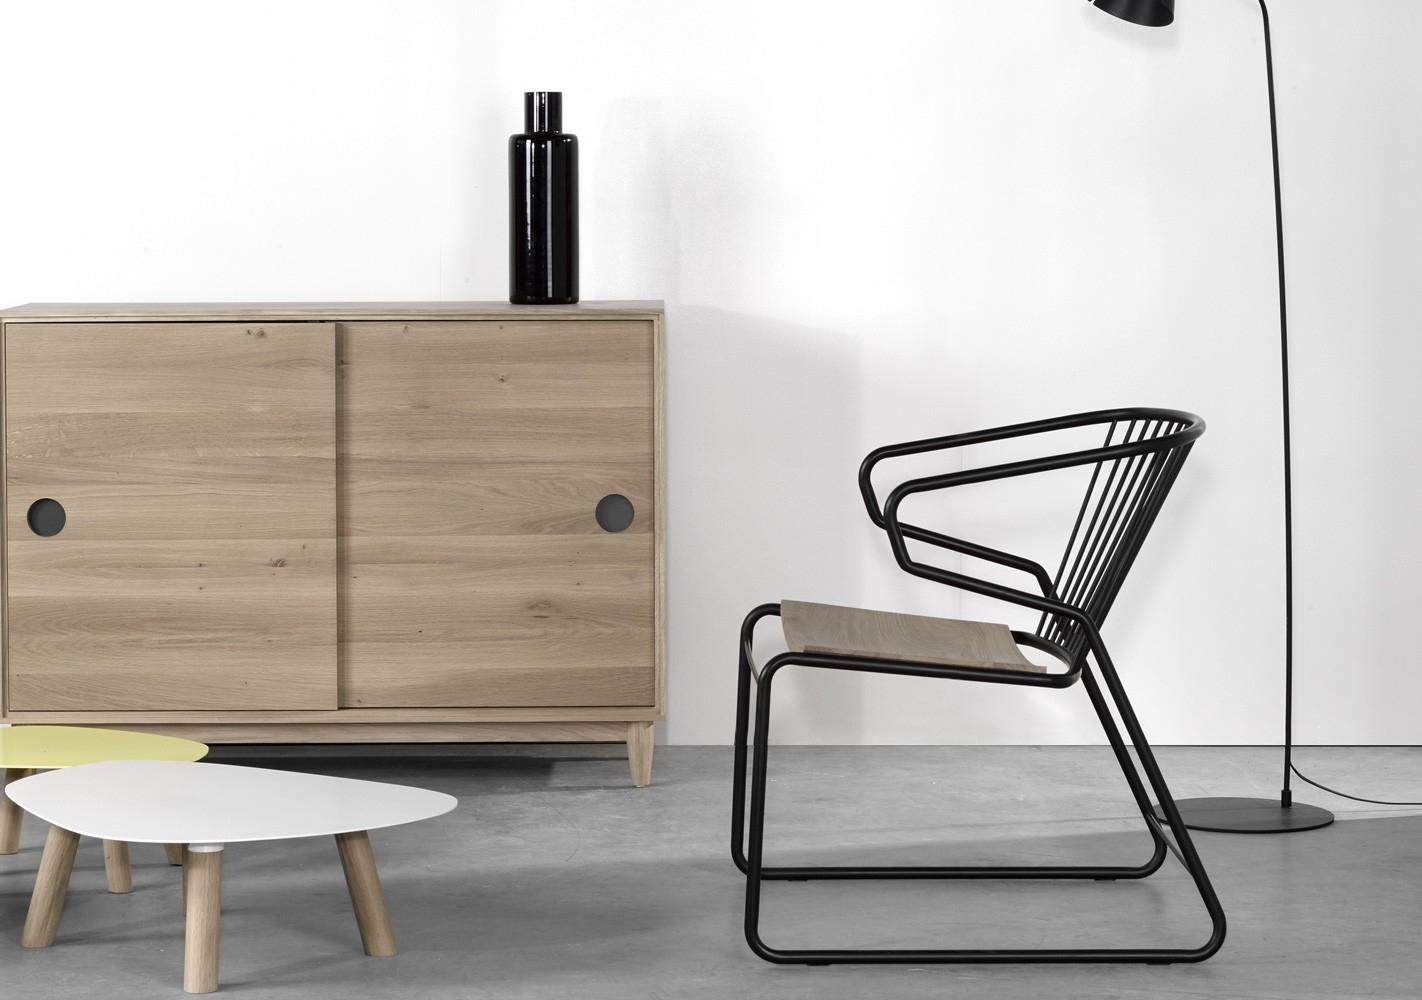 fauteuil gabbia design - ethnicraft